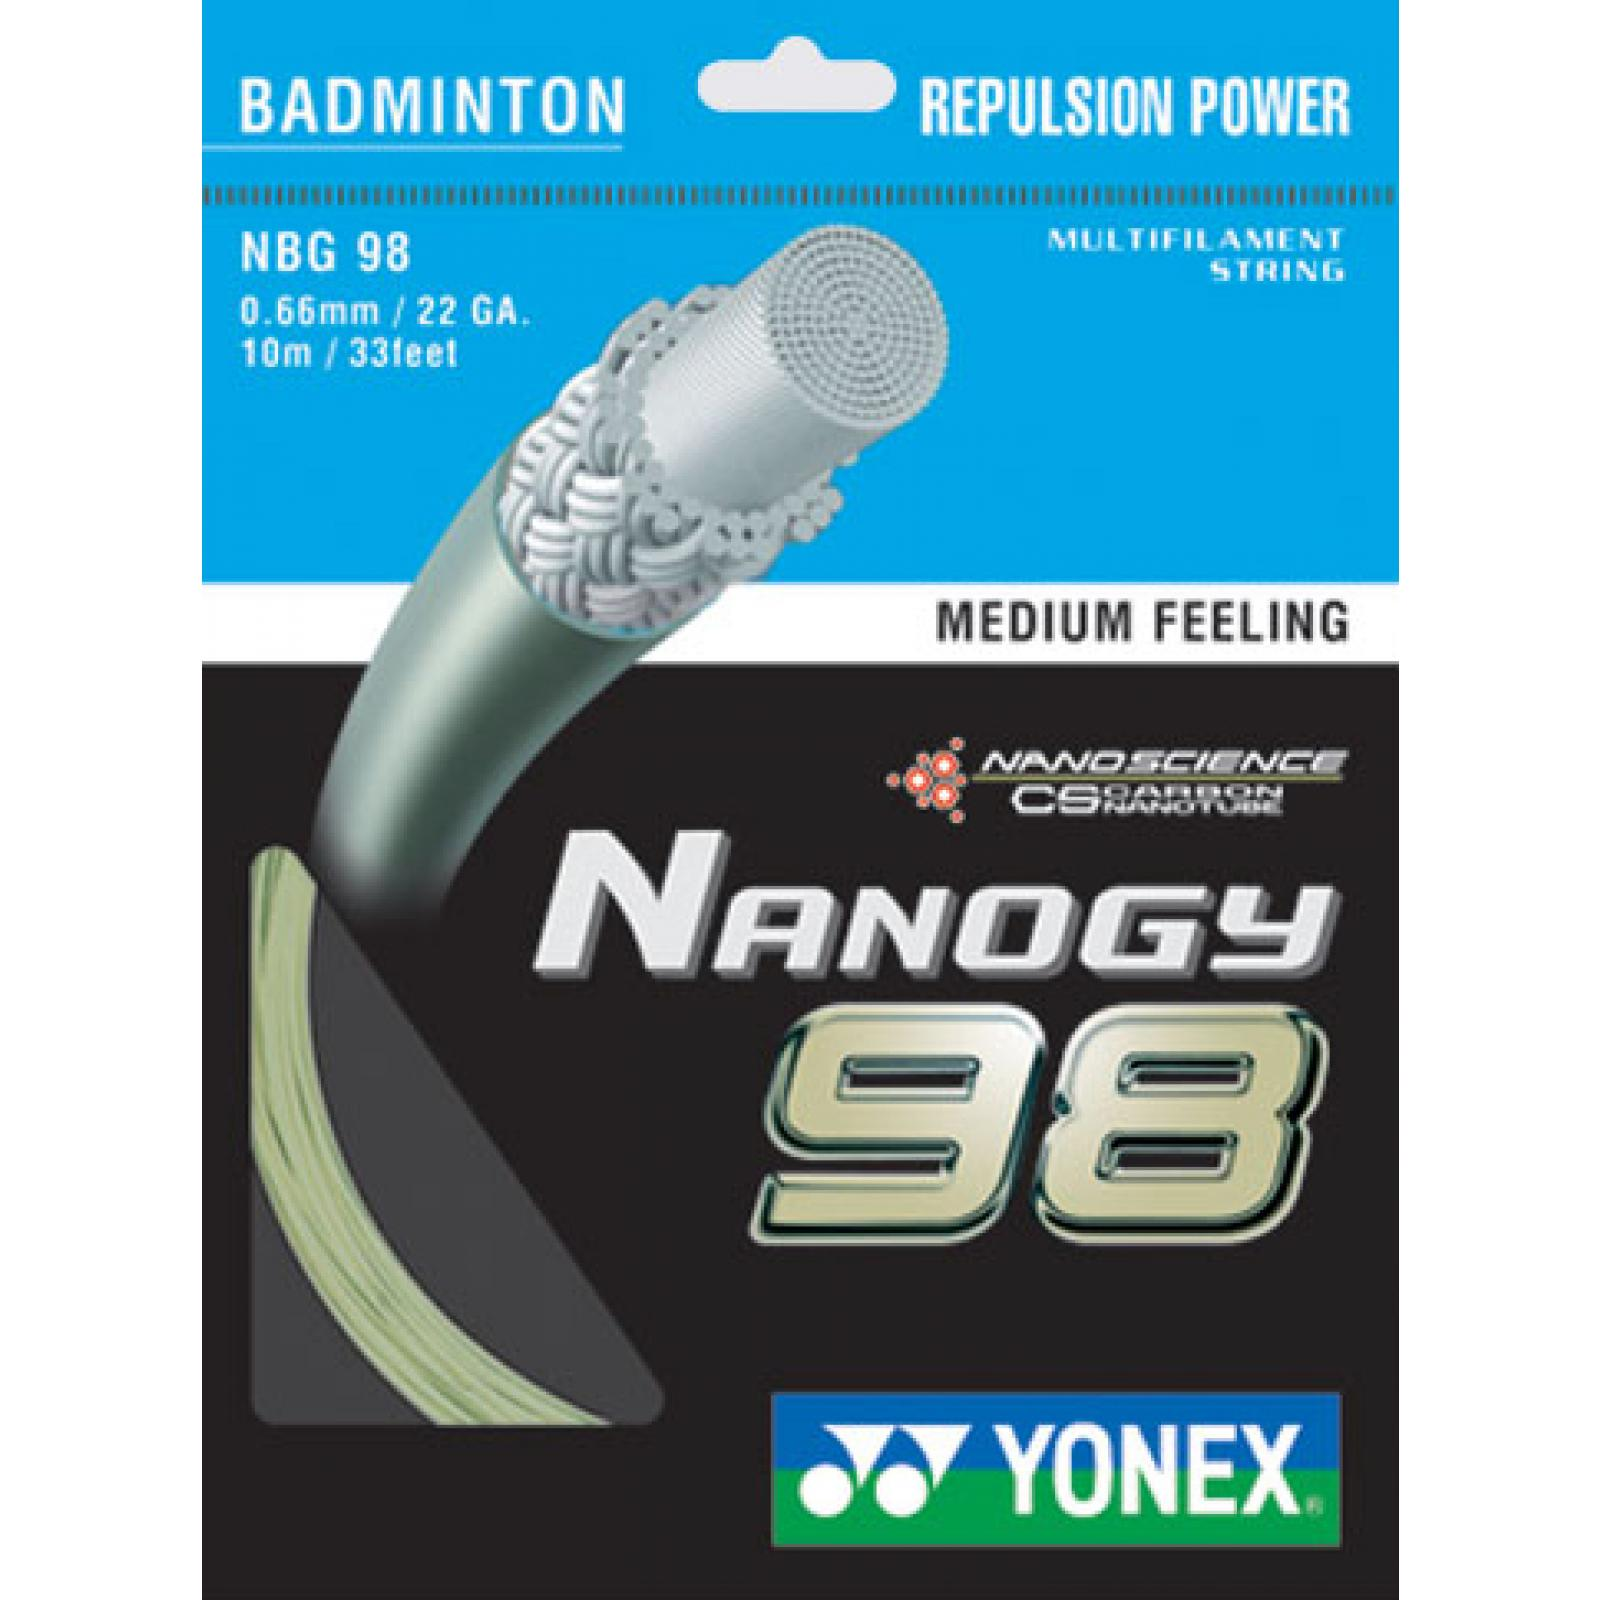 https://www.badec.store/produkty_img/badmintonovy-vyplet1571925663L.jpg